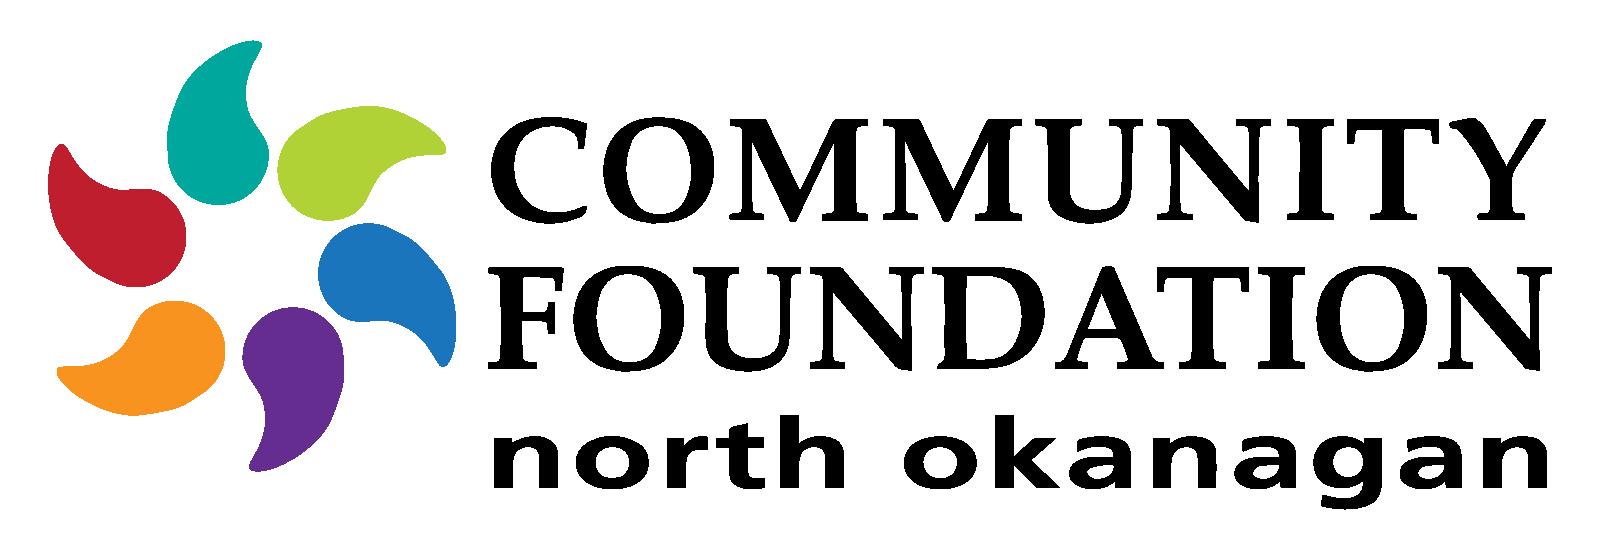 Community Foundation North Okanagan logo